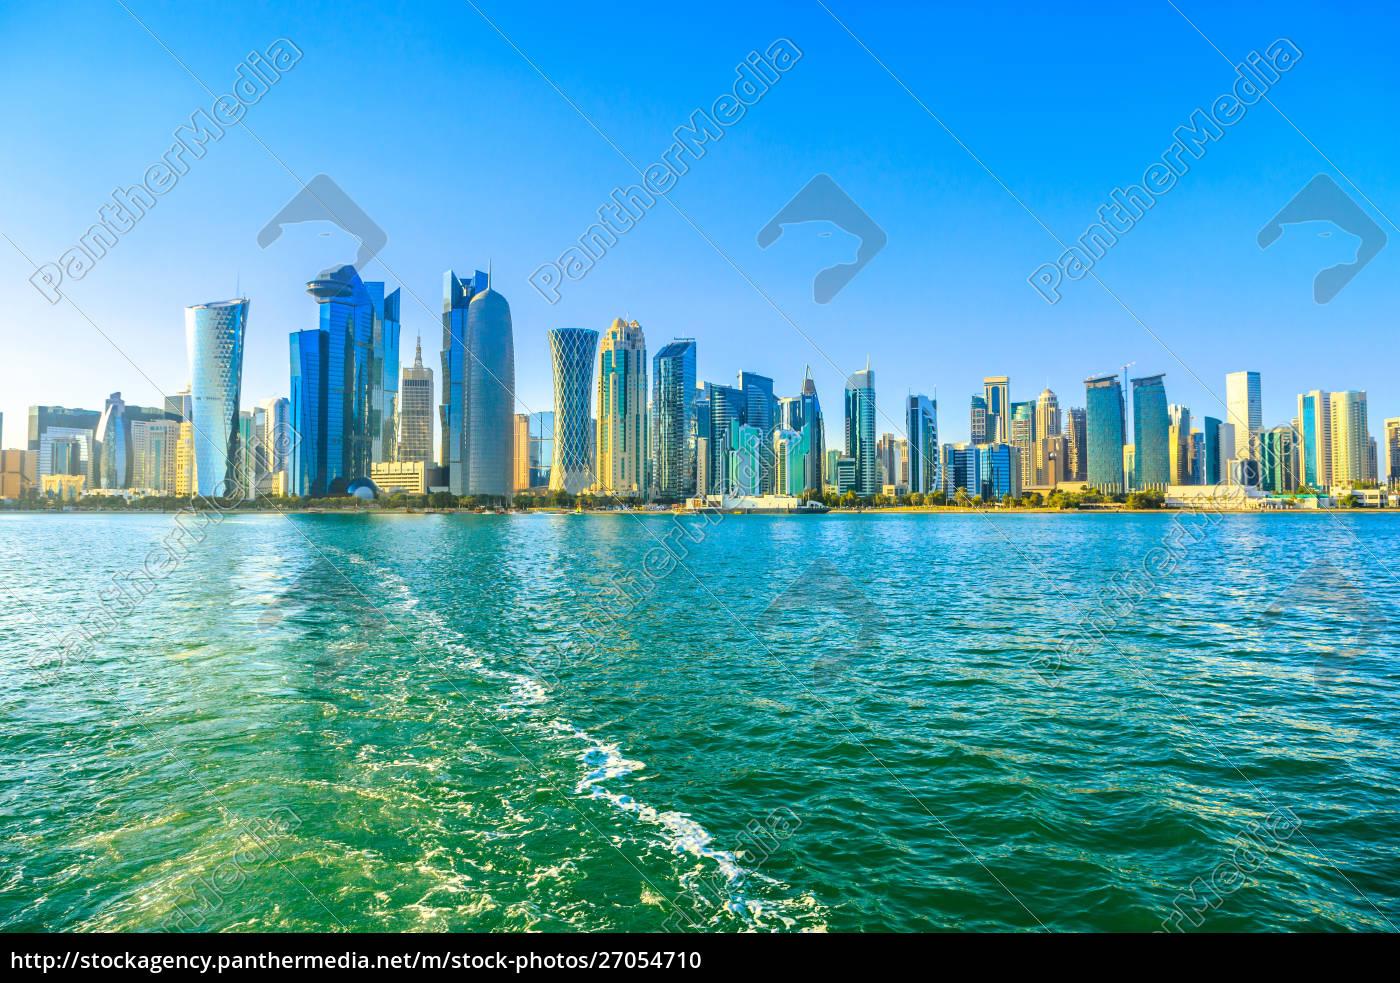 cityscape, of, doha, west, bay, skyline - 27054710